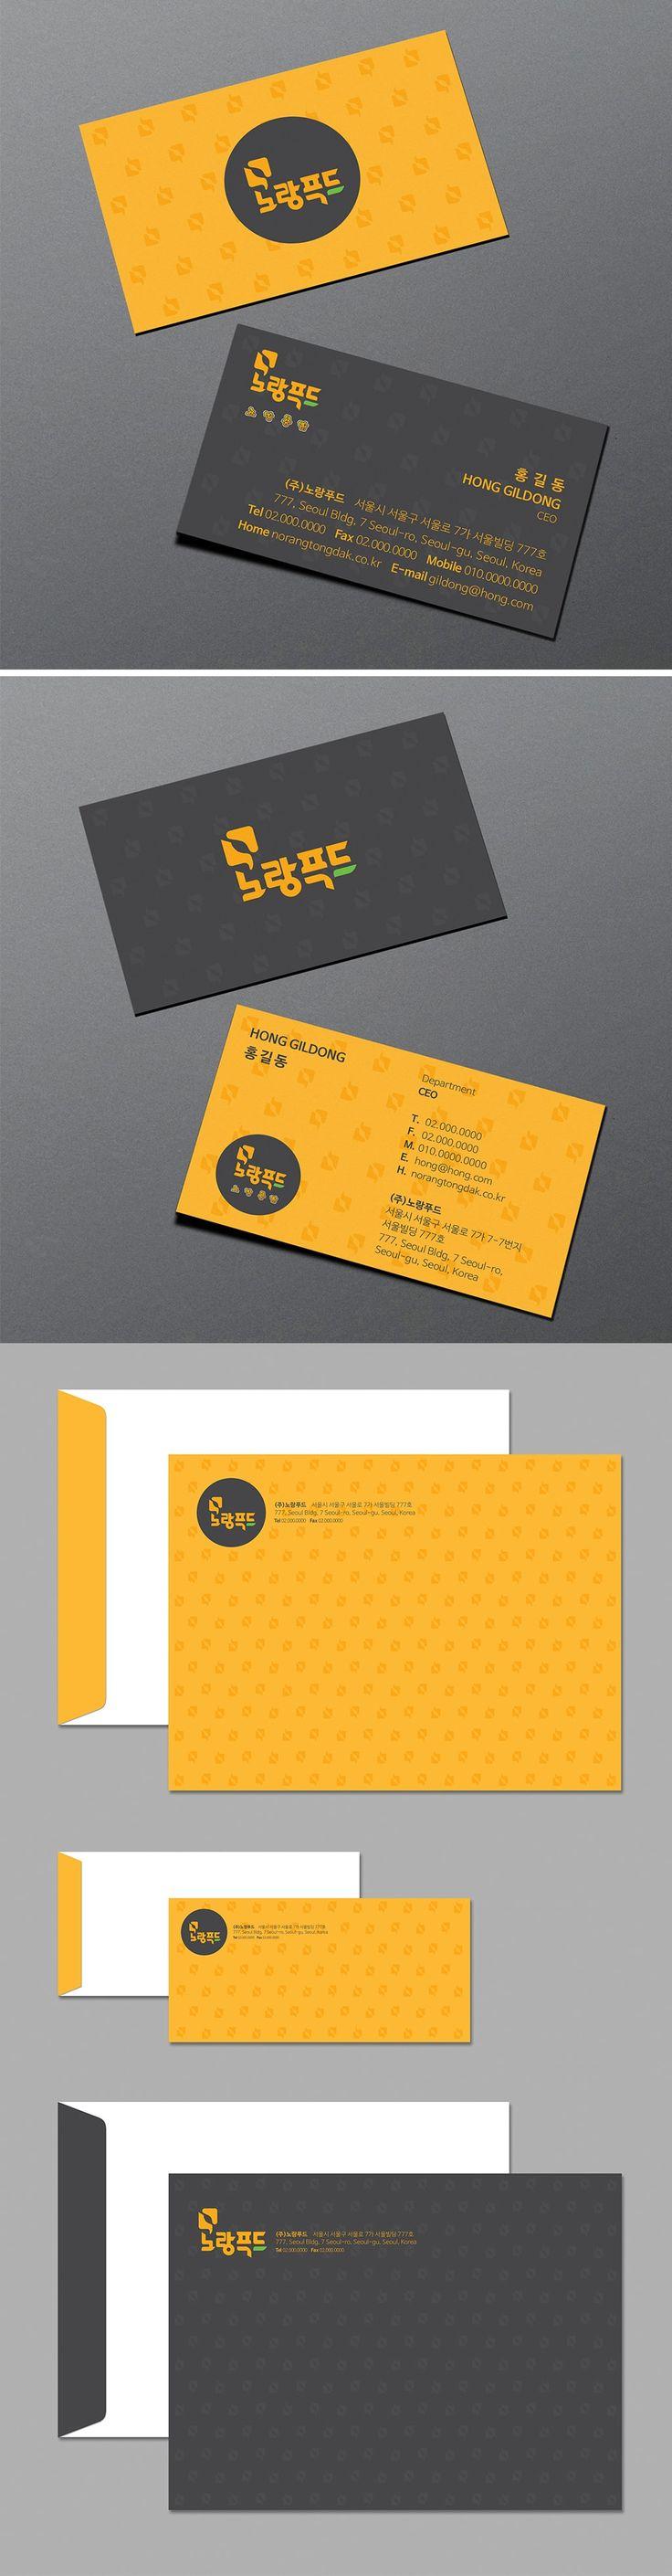 Design by design4eva/ #봉투 #봉투디자인 #명함 #명함디자인 #디자인 #디자이너 #라우드소싱 #레퍼런스 #콘테스트 #editorial #poster #design #illust #포트폴리오 #디자인의뢰 #공모전 #일러스트 #포스터 #편집 #편집디자인 #일러스트 #card #color #타이포그래피